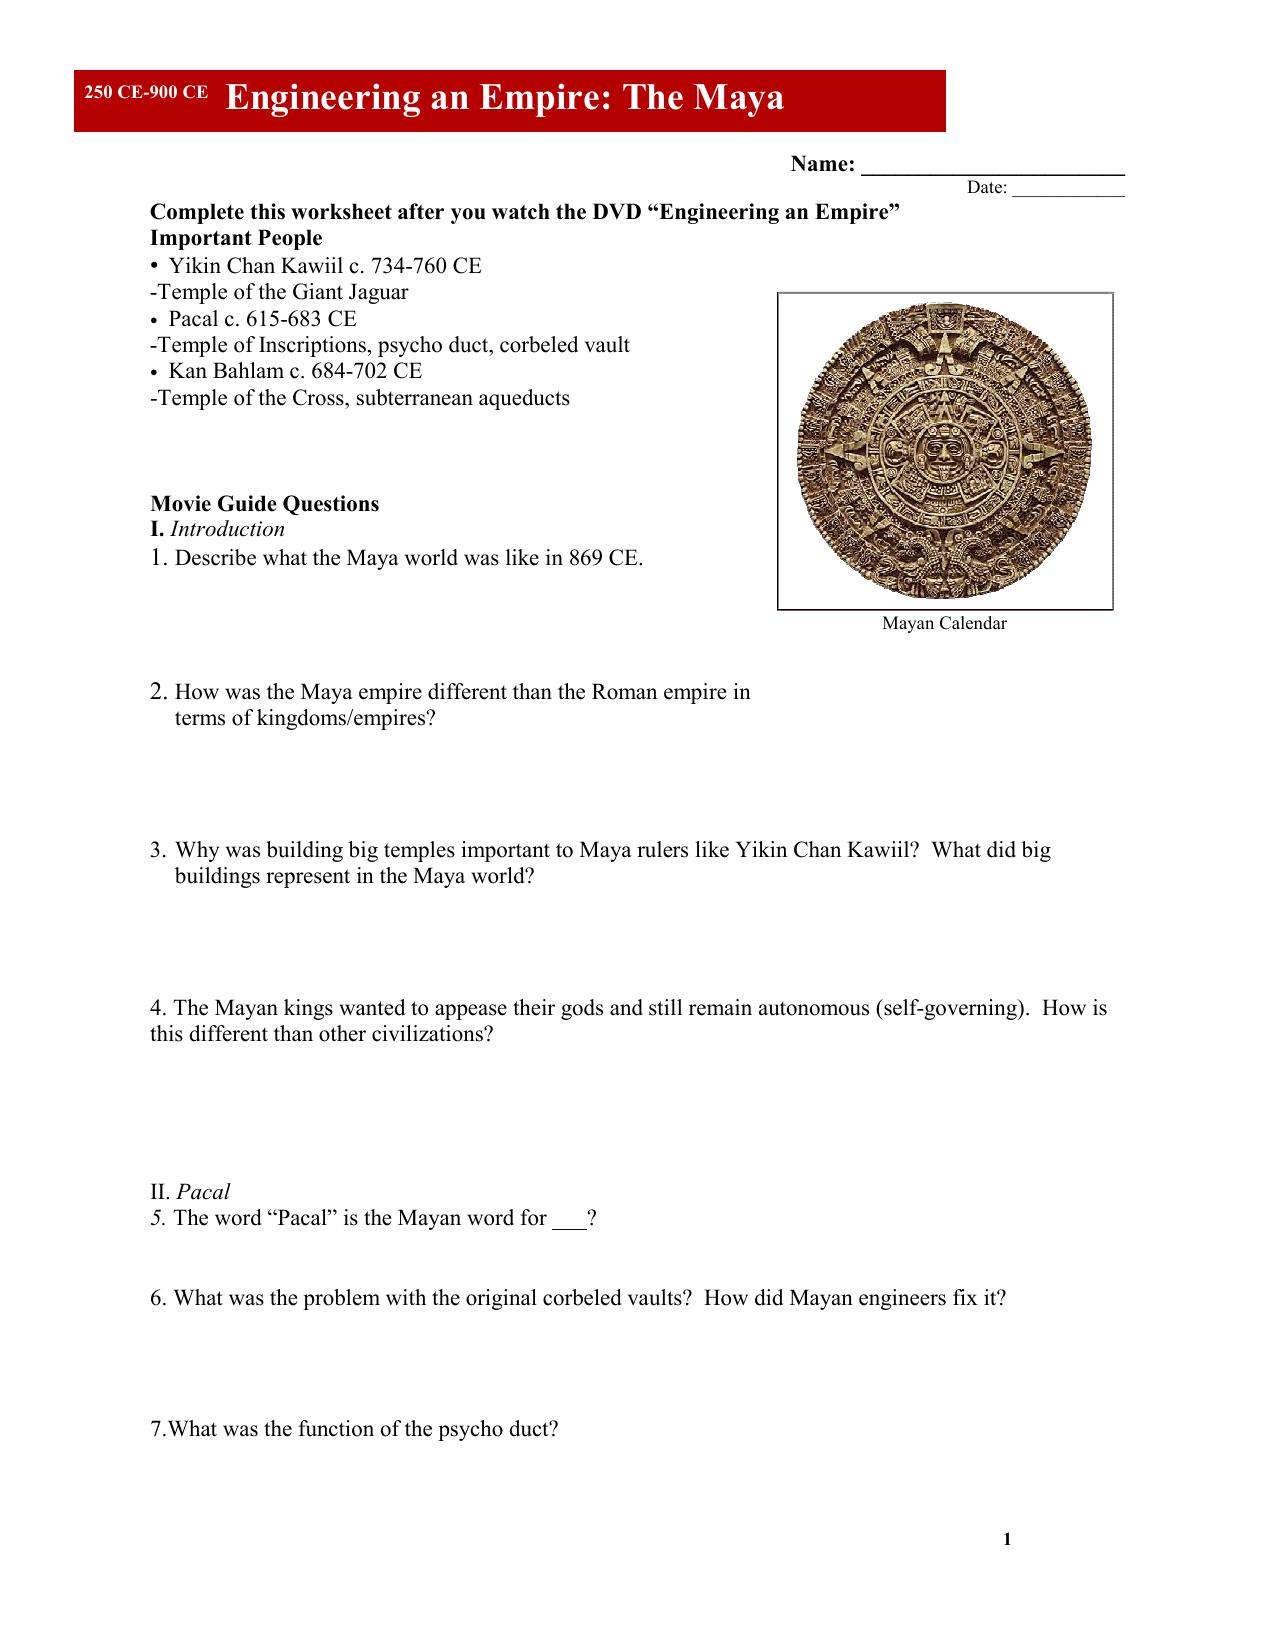 Engineering an Empire The Maya Worksheet - Reeths